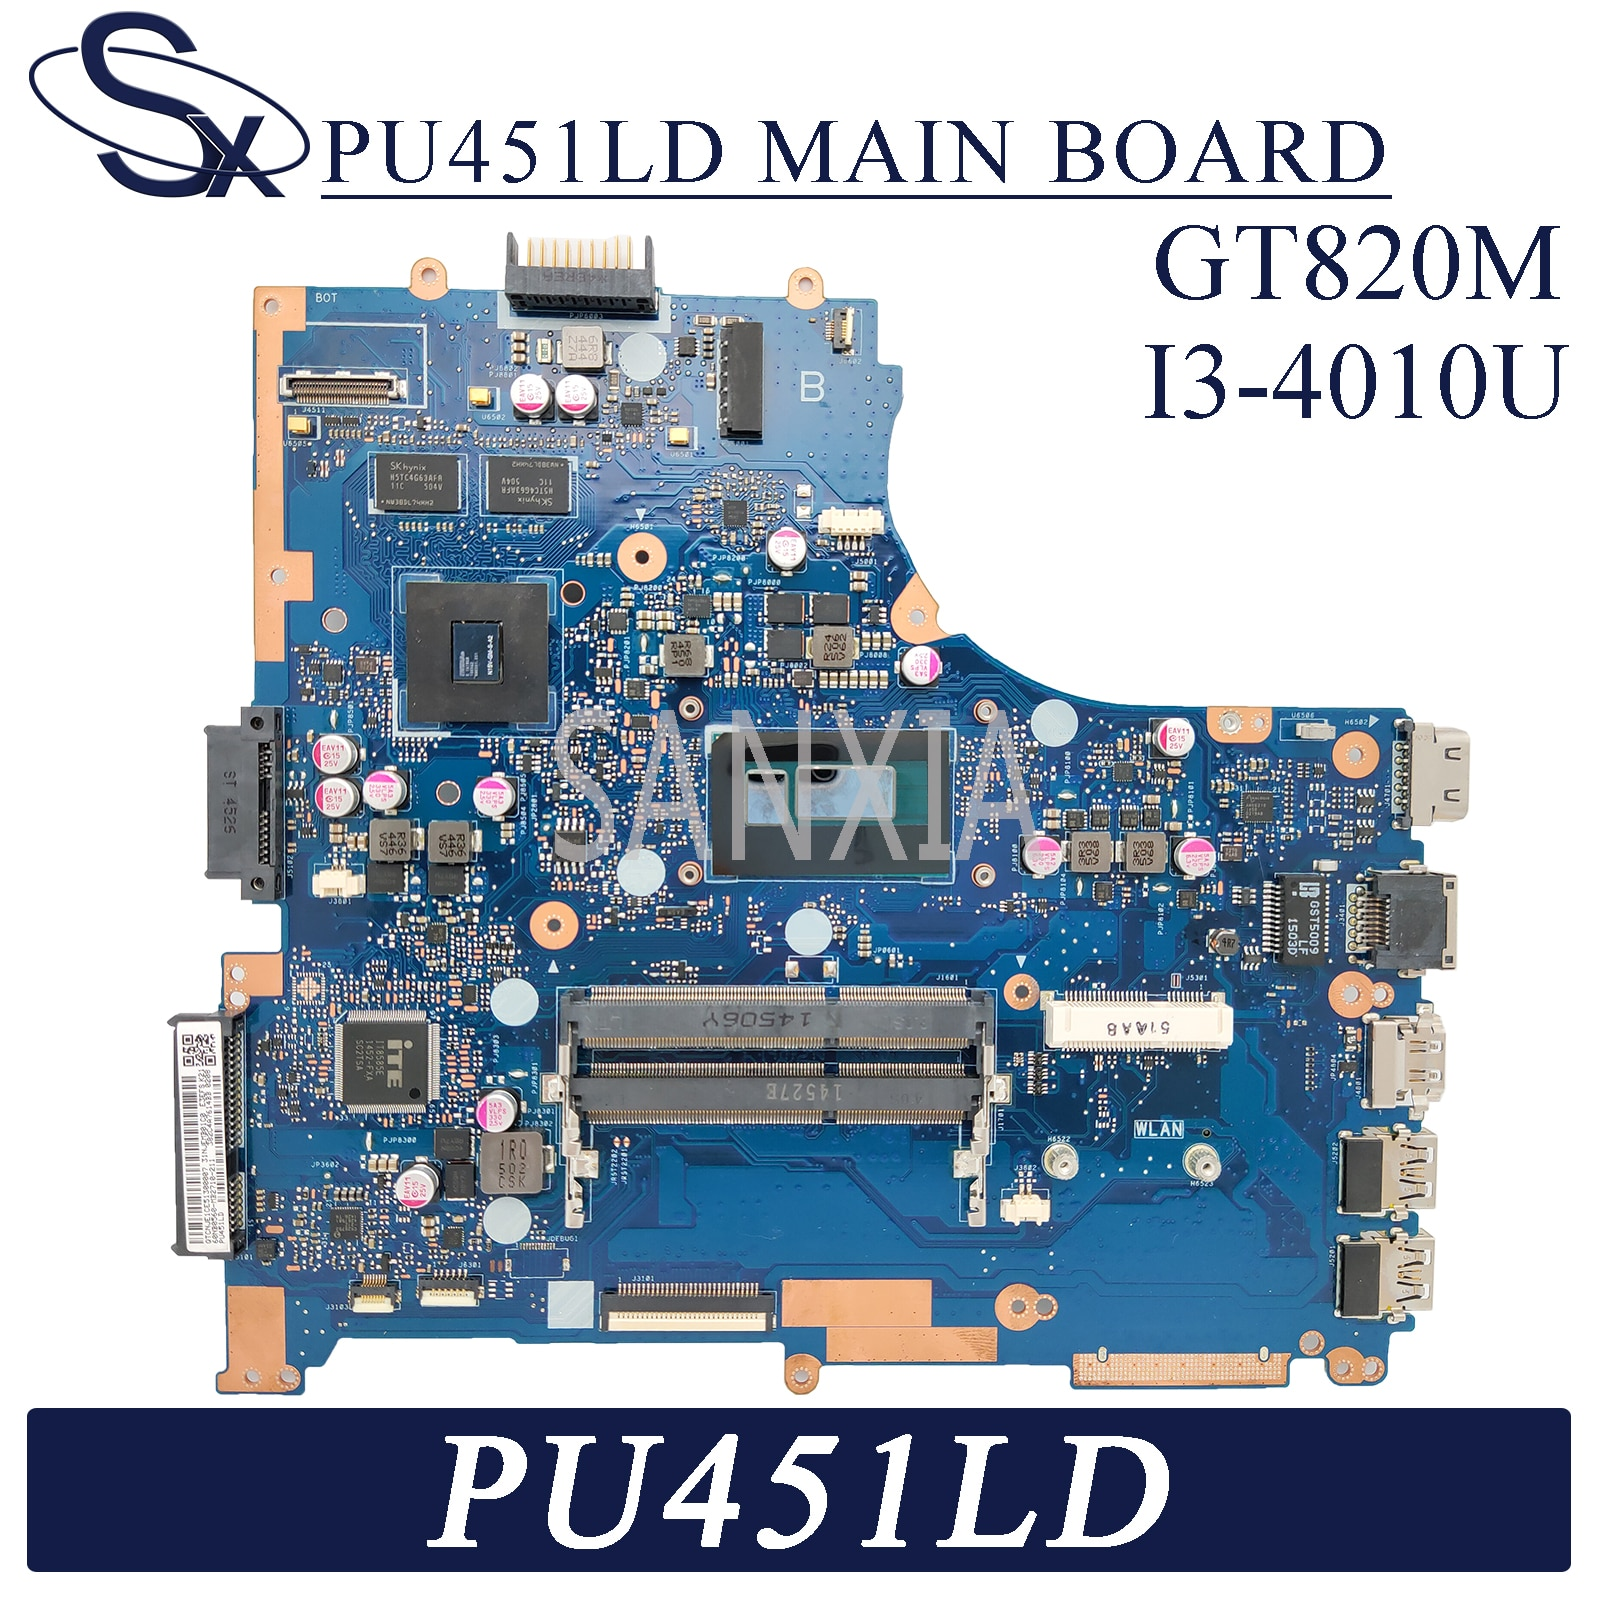 KEFU PU451LD اللوحة الأم لأجهزة الكمبيوتر المحمول ASUS PU451LD PU451L اللوحة الرئيسية الأصلية I3-4010U GT820M